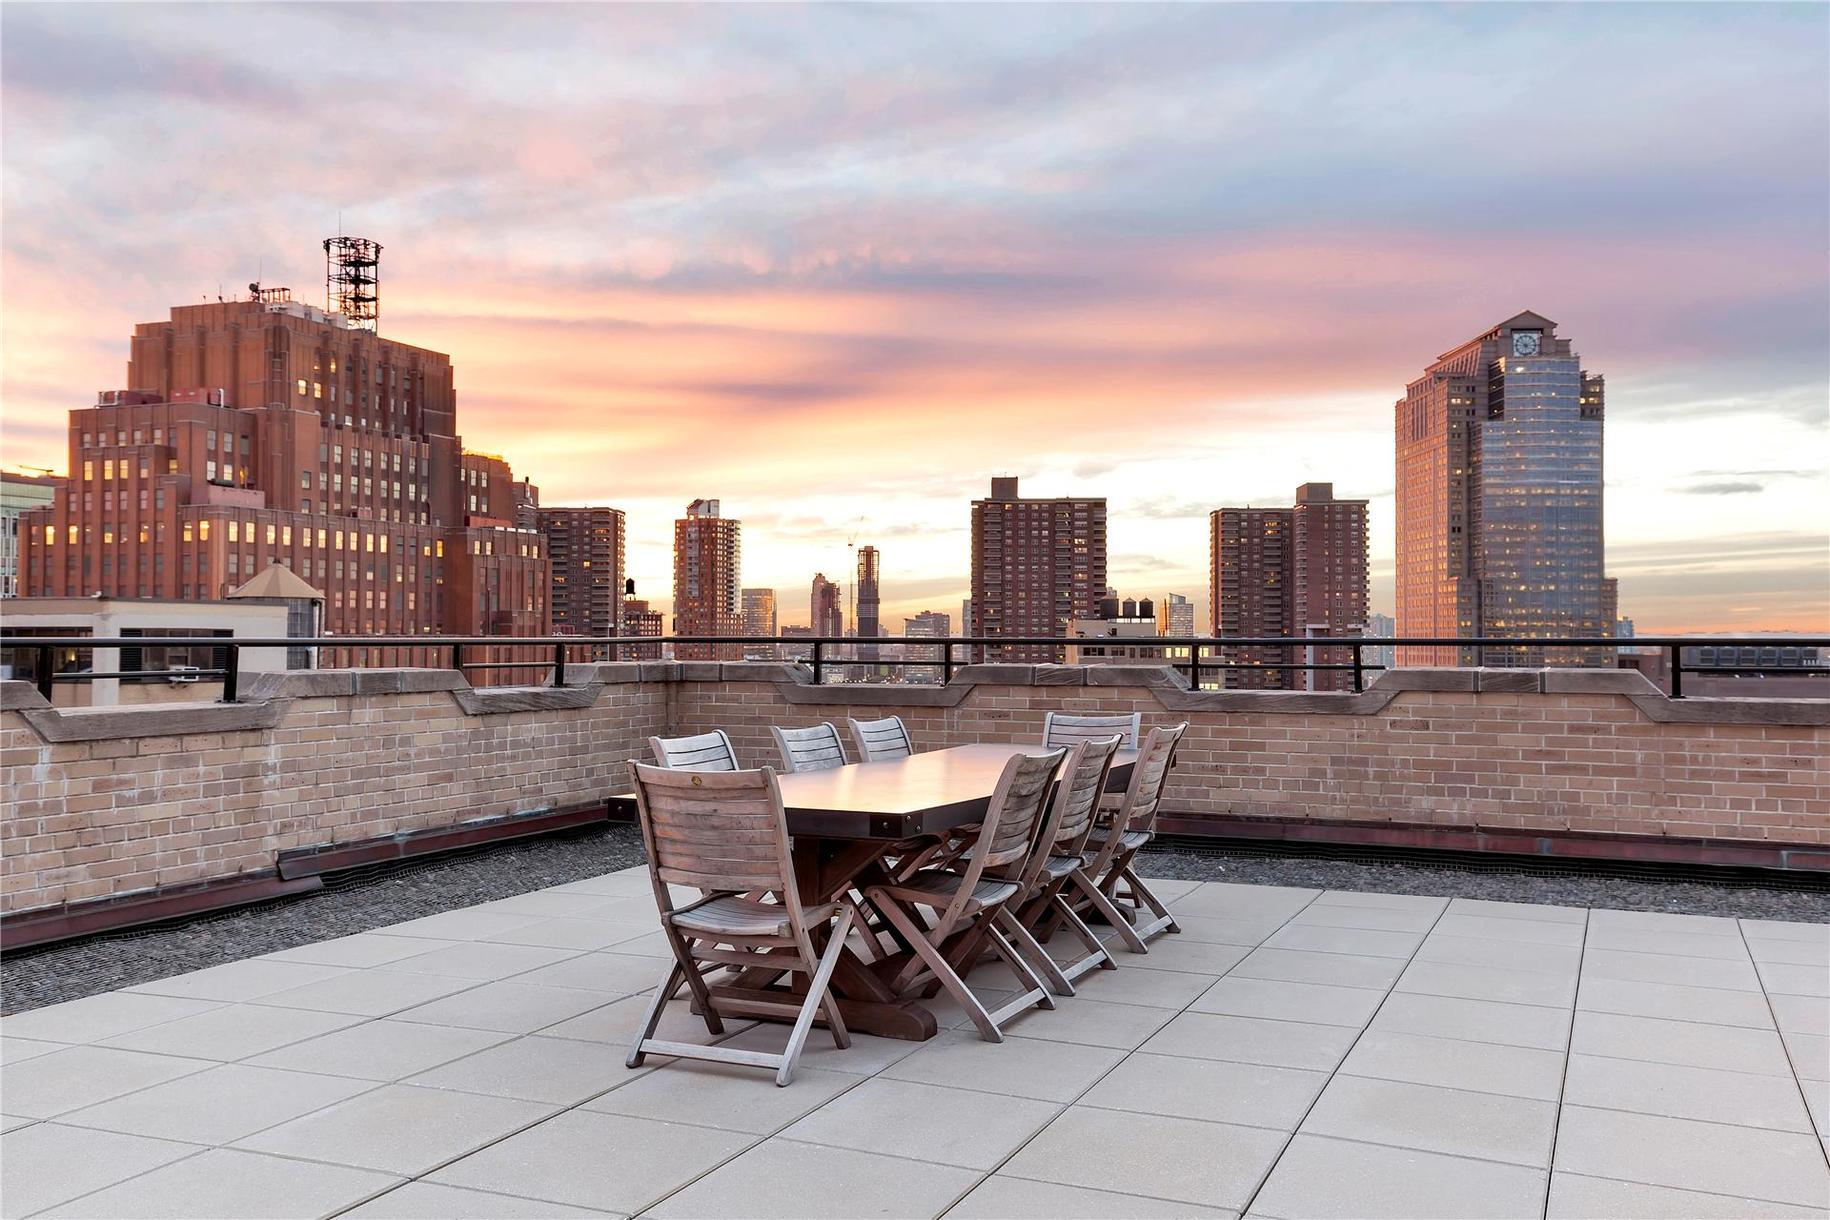 90 Franklin Street, Franklin Tower, Tribeca, trophy condo, Cool Listings, Isabel Rose, Rose Associates, Mariah Carey